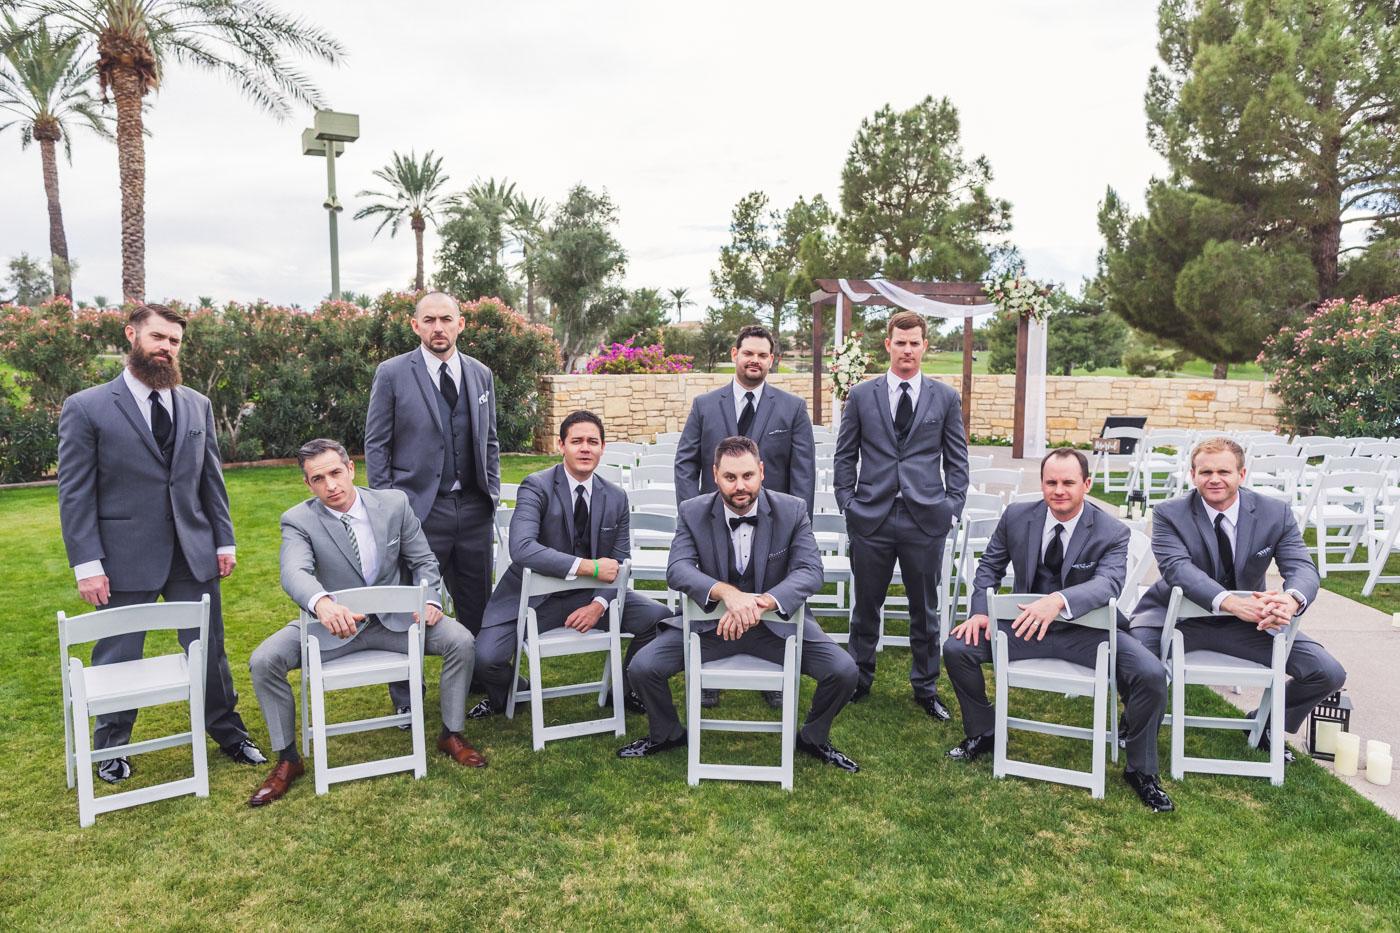 groom-and-groomsmen-wedgewood-ocotillo-wedding